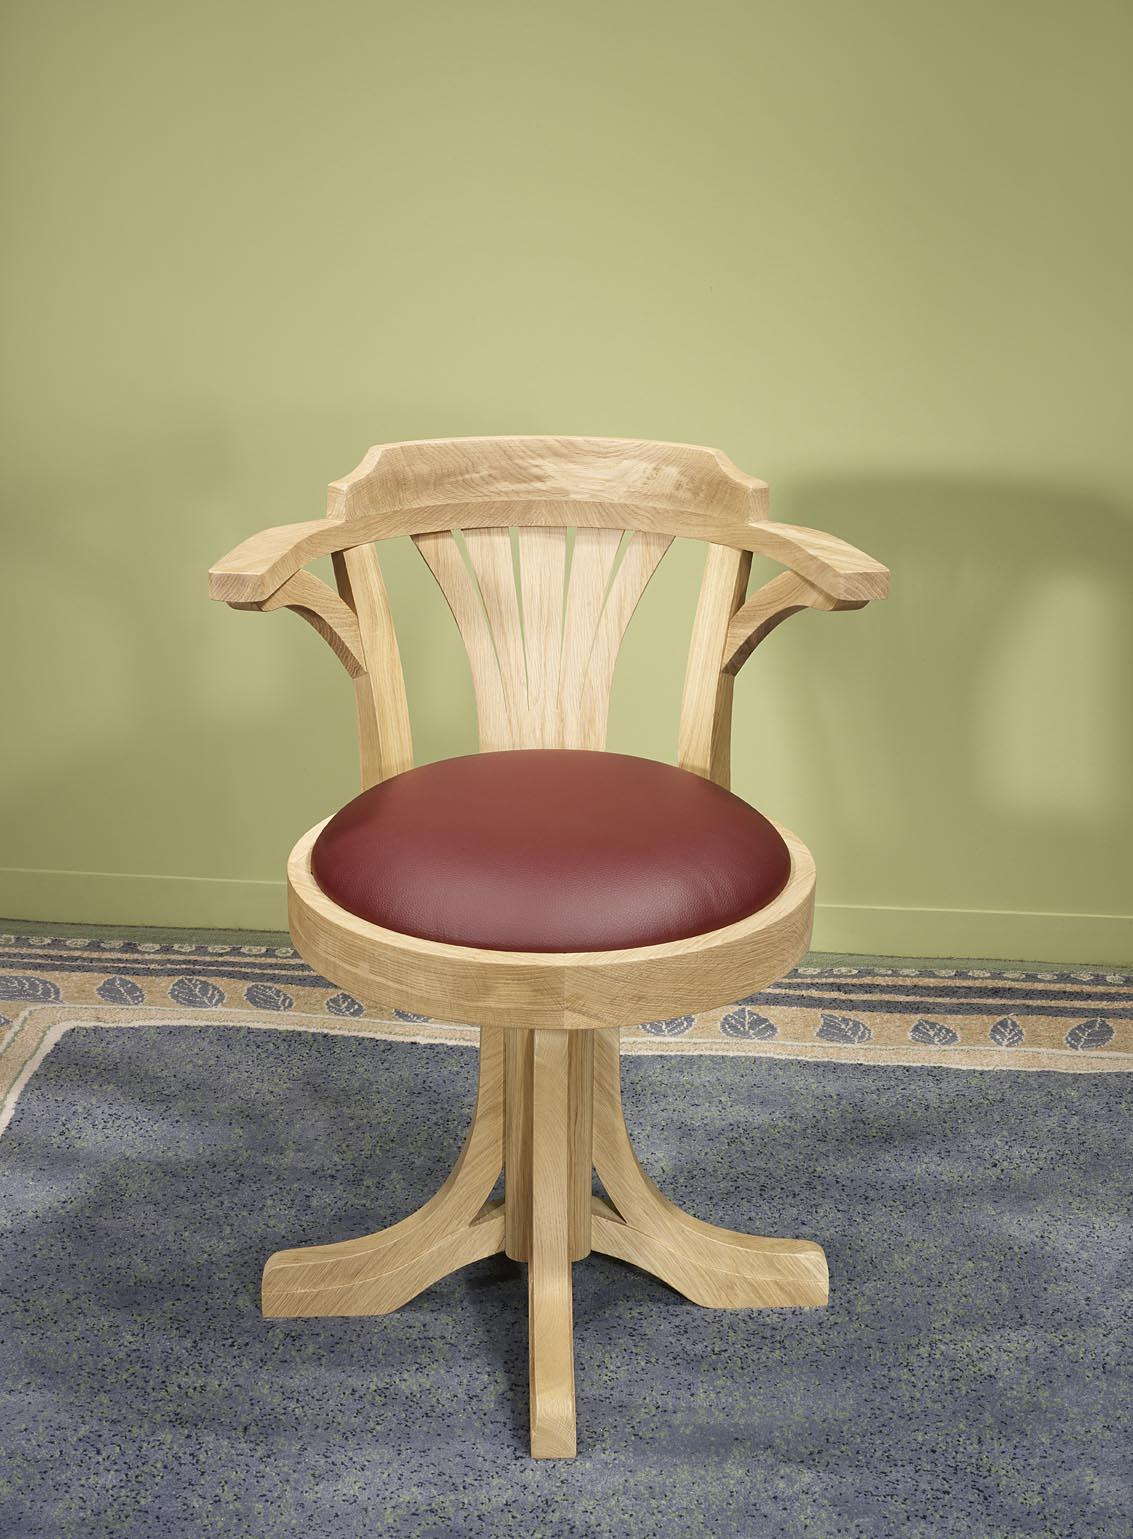 Fauteuil de bureau marc en ch ne massif pivotant assise for Fauteuil de bureau en bois pivotant